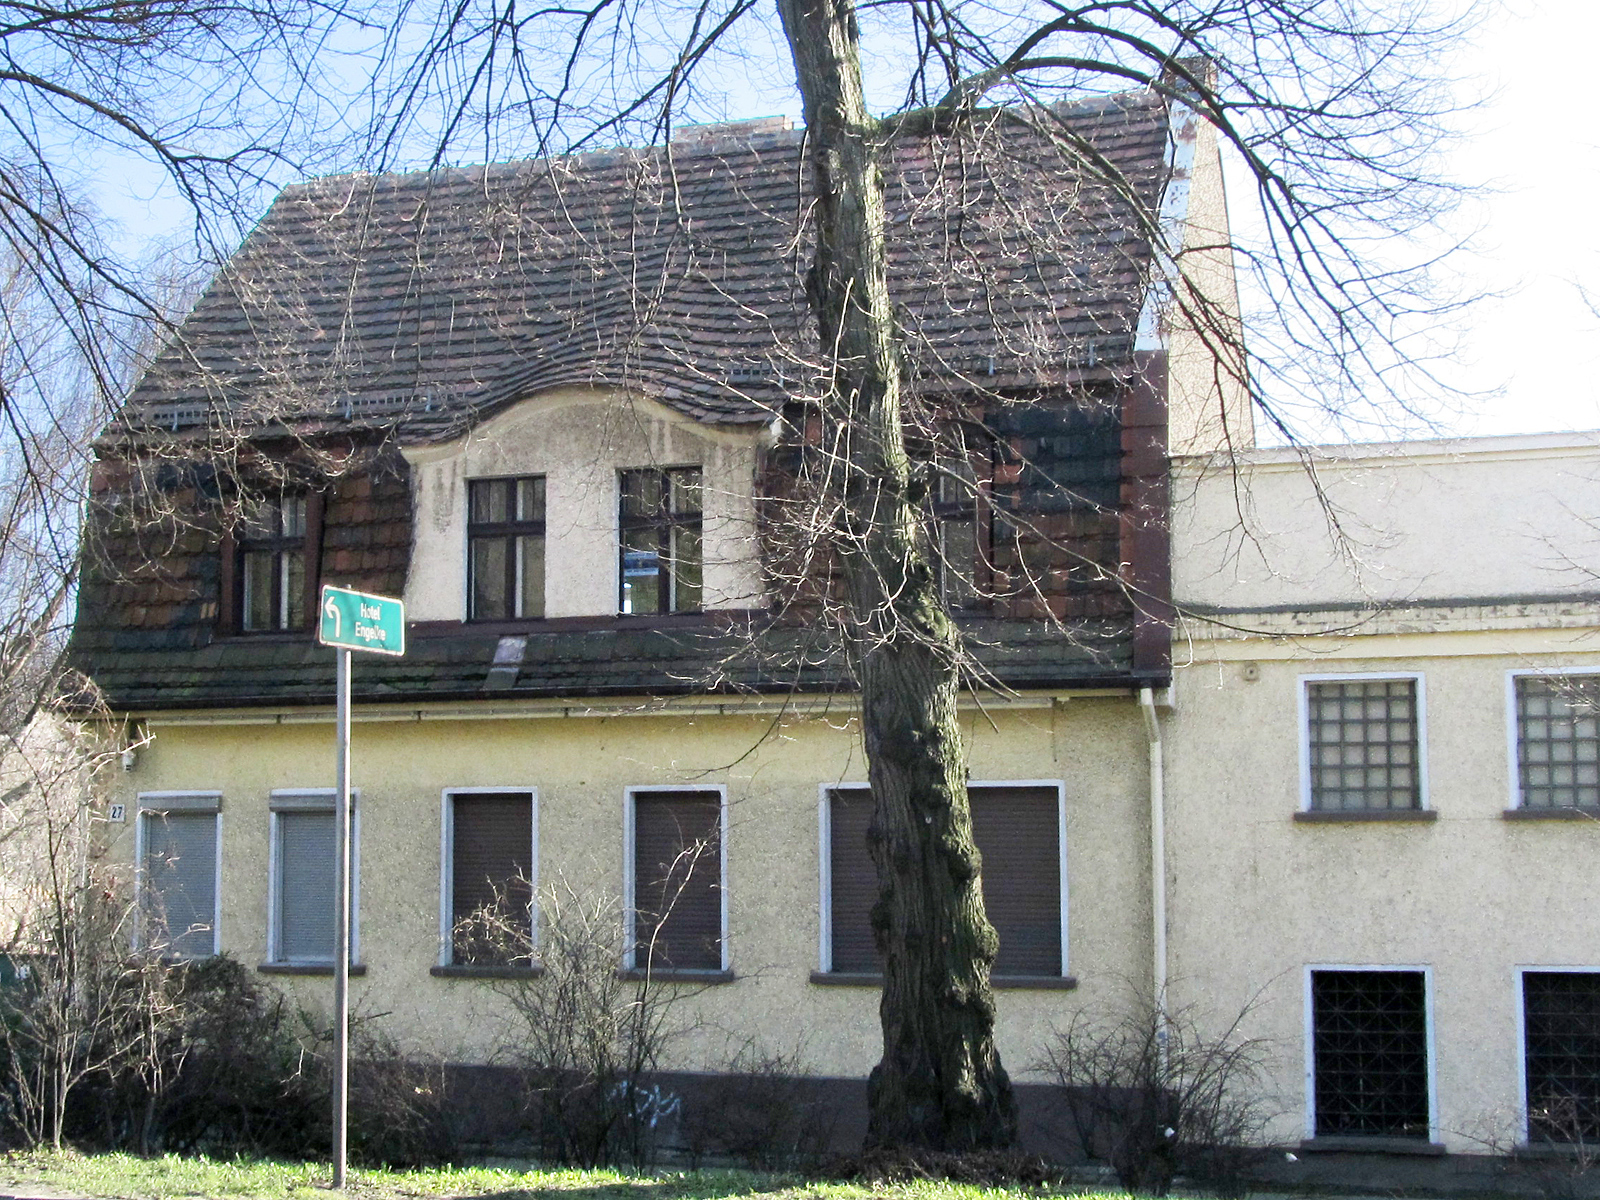 Datei:Berlin Biesdorf AltBiesdorf27.JPG – Wikipedia